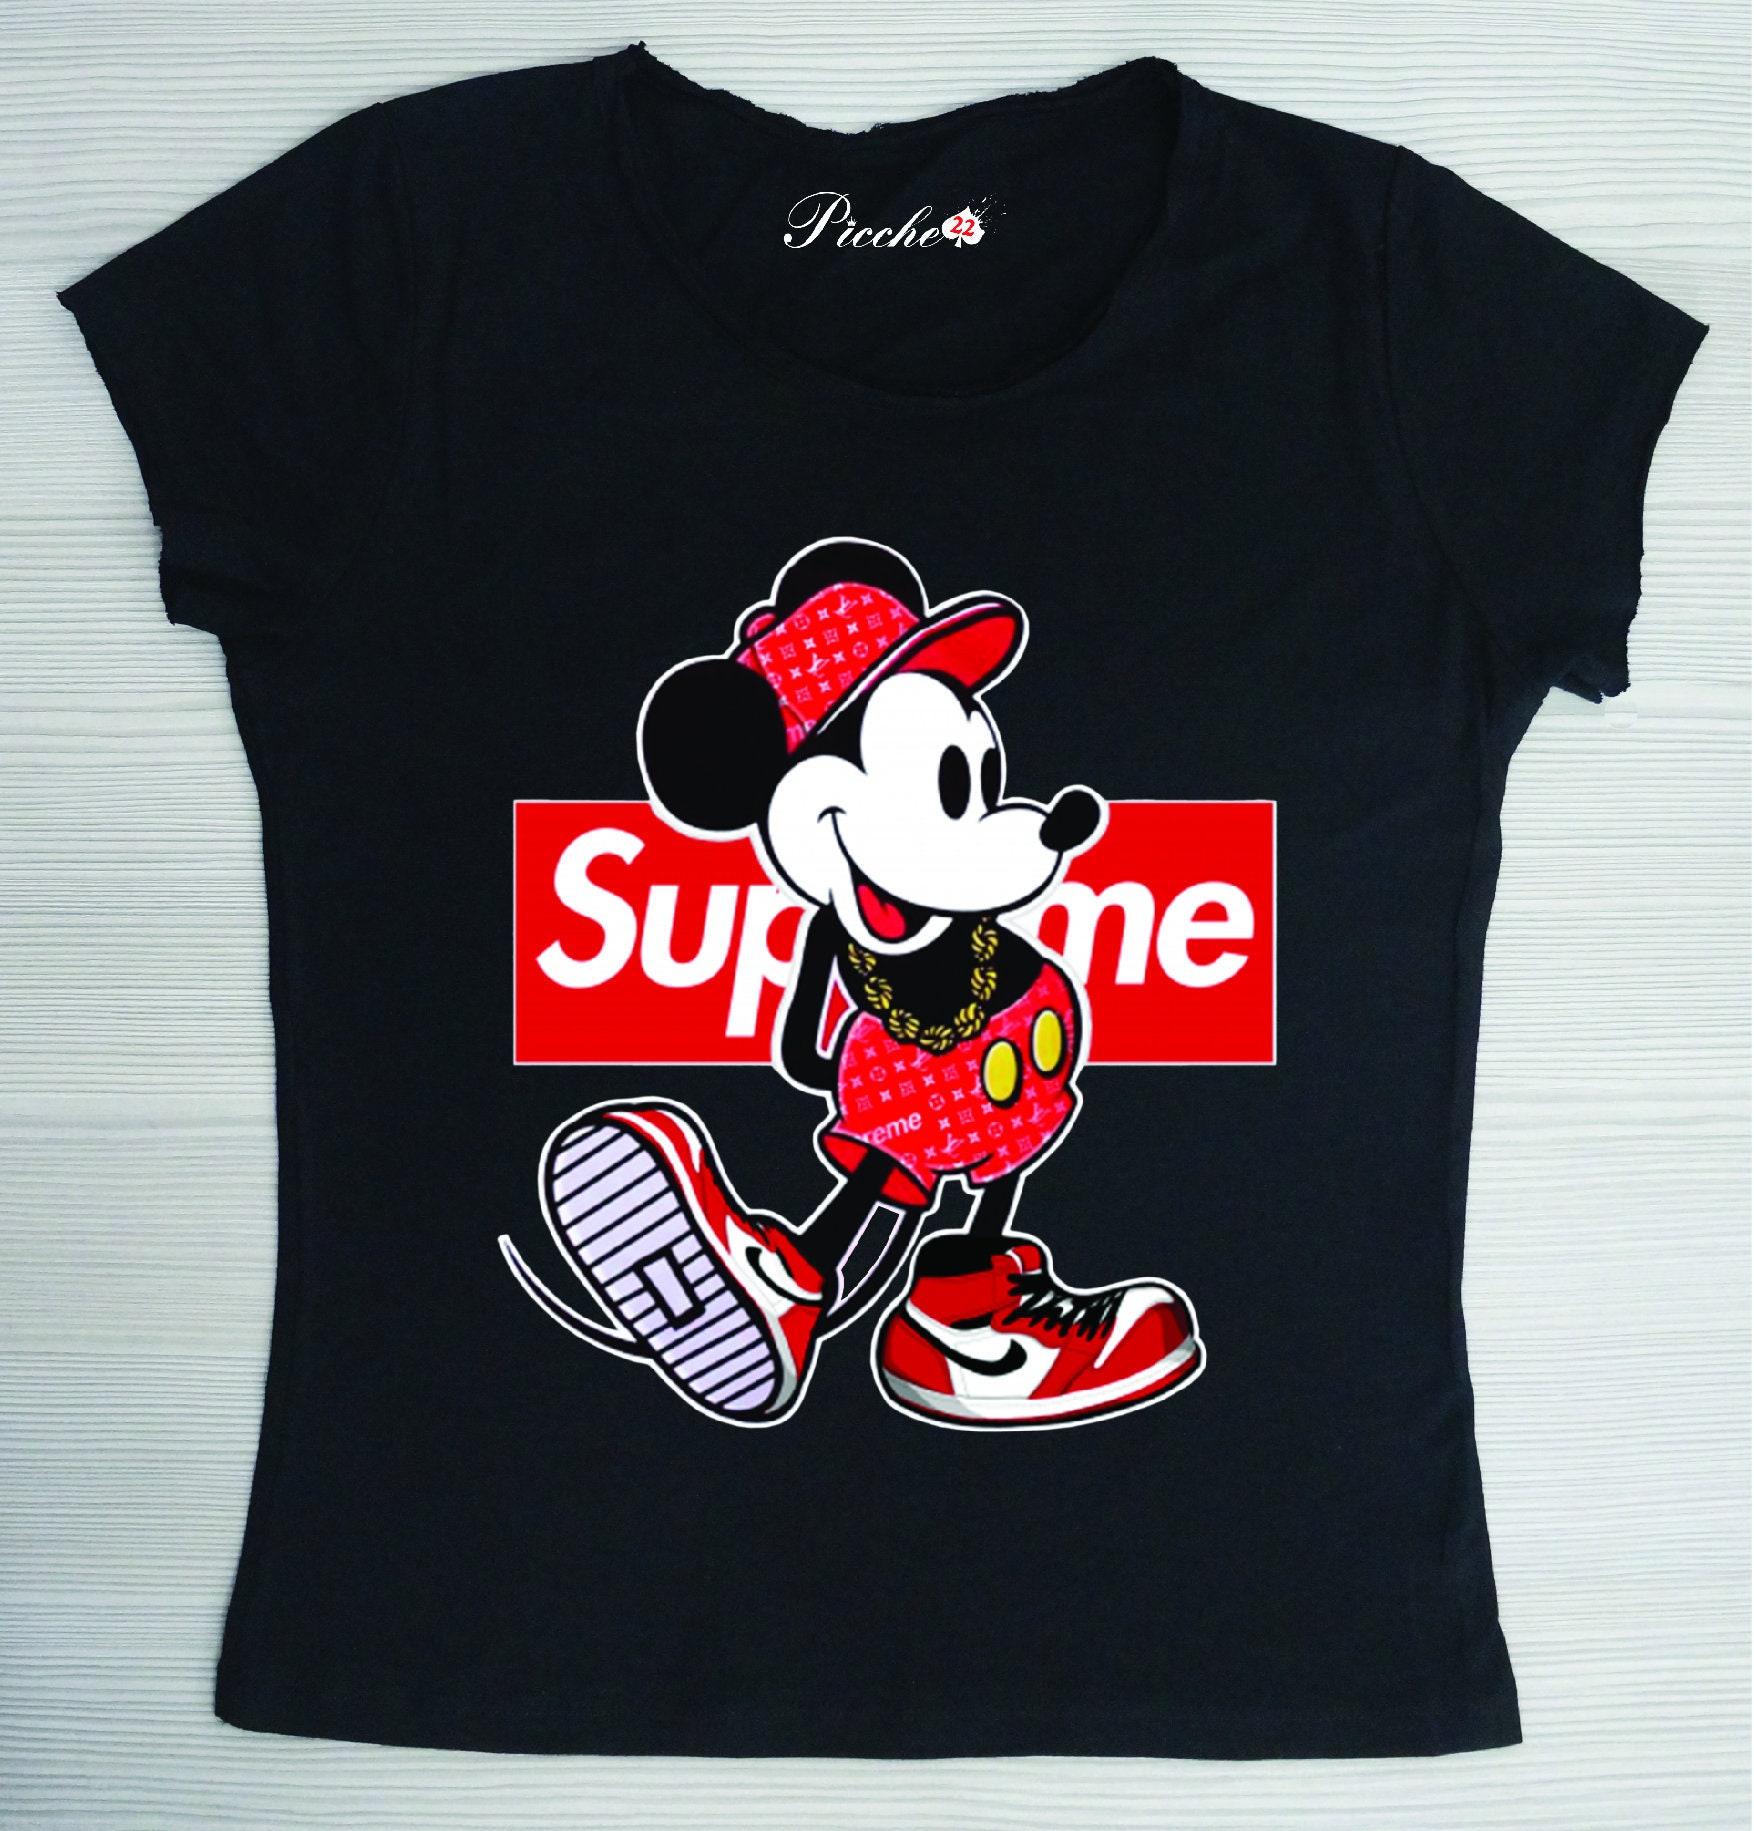 dfdb56c20ced T-Shirt Man or Woman White or Black model: Supreme | Etsy